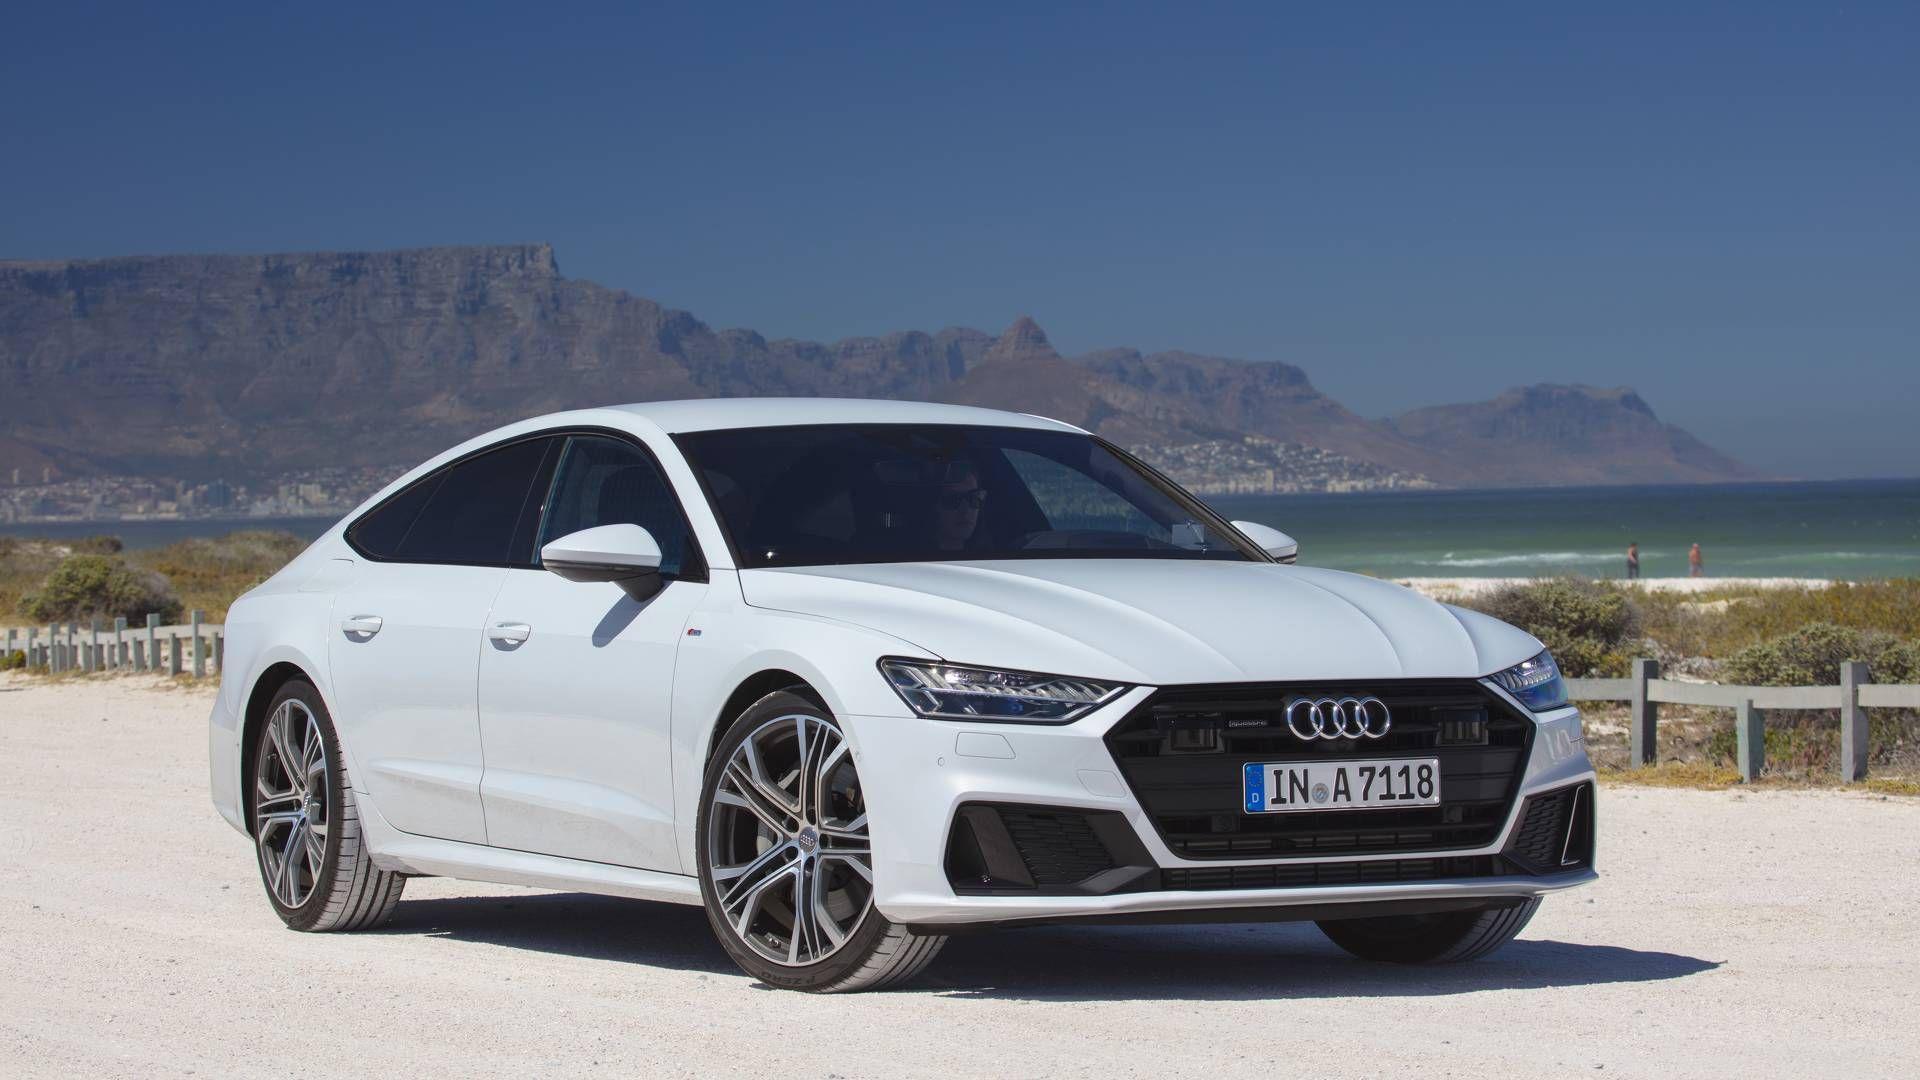 2018 Audi A7 Sportback Audi A7